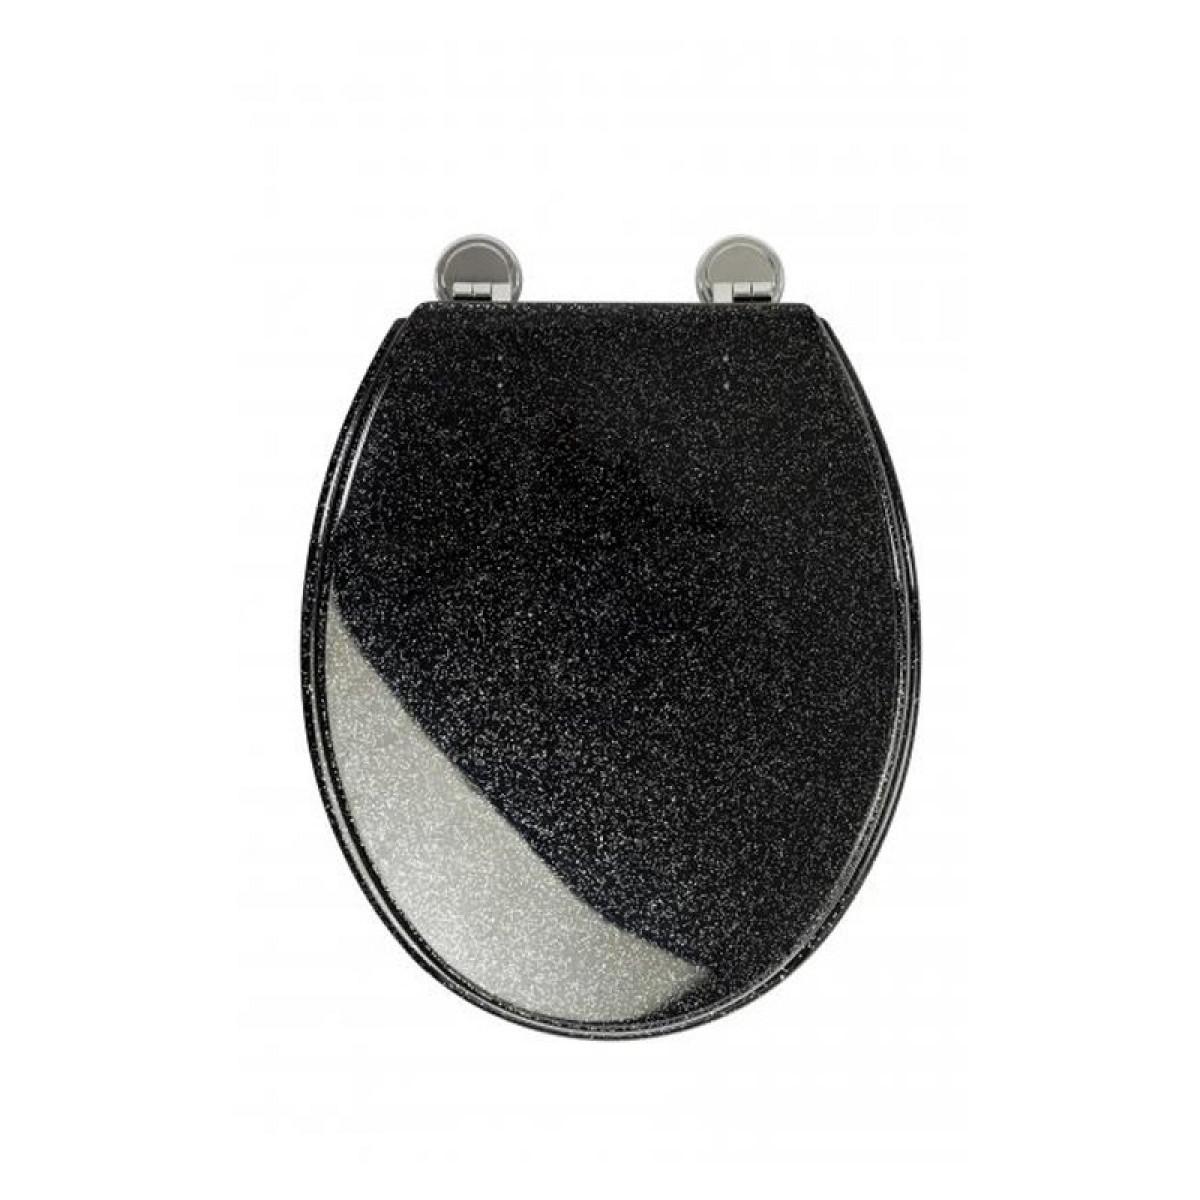 croydex black glitter toilet seat wl101021. Black Bedroom Furniture Sets. Home Design Ideas